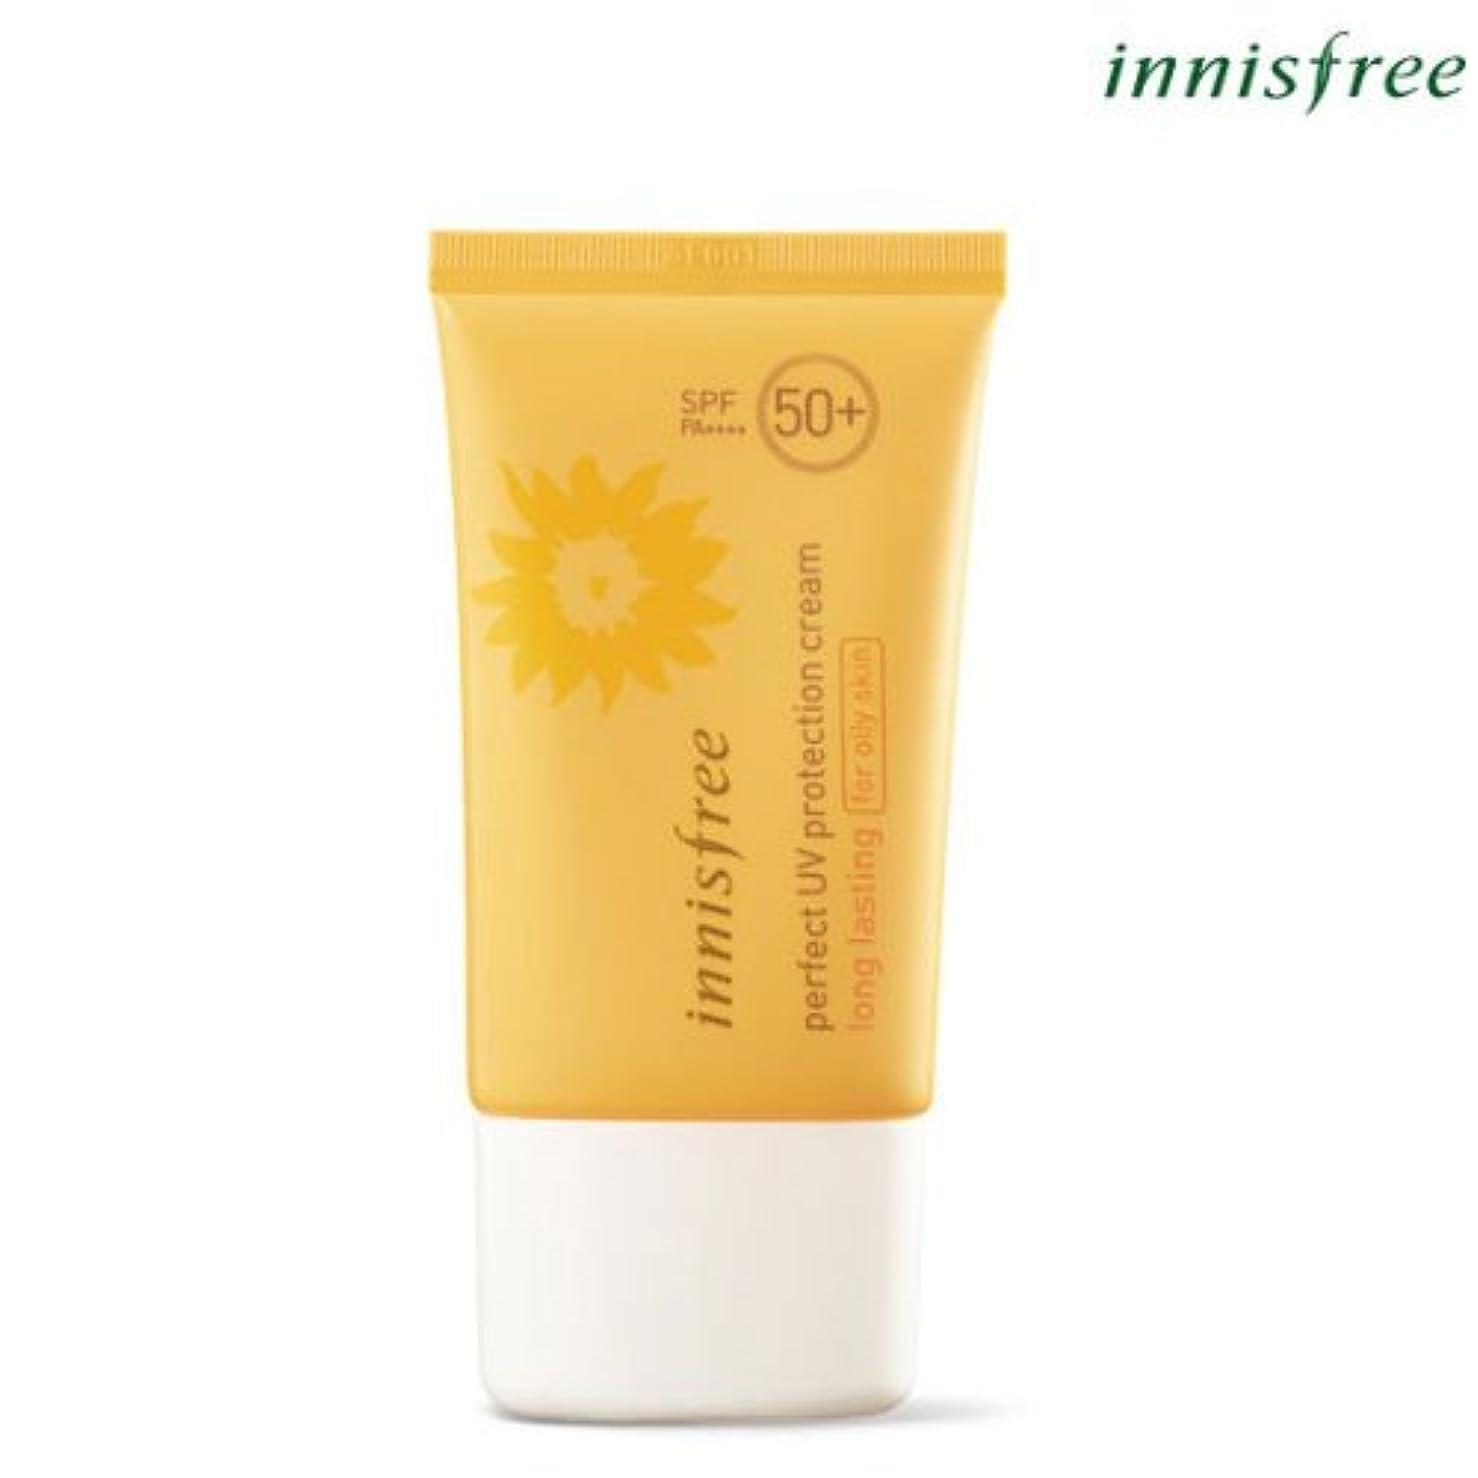 [INNISFREE]イニスフリーパーフェクト UV プロテクション クリームロングラスティング[オイリー肌のためFOR OILY SKIN]SPF50+ PA++++ 50mL perfect UV protection...